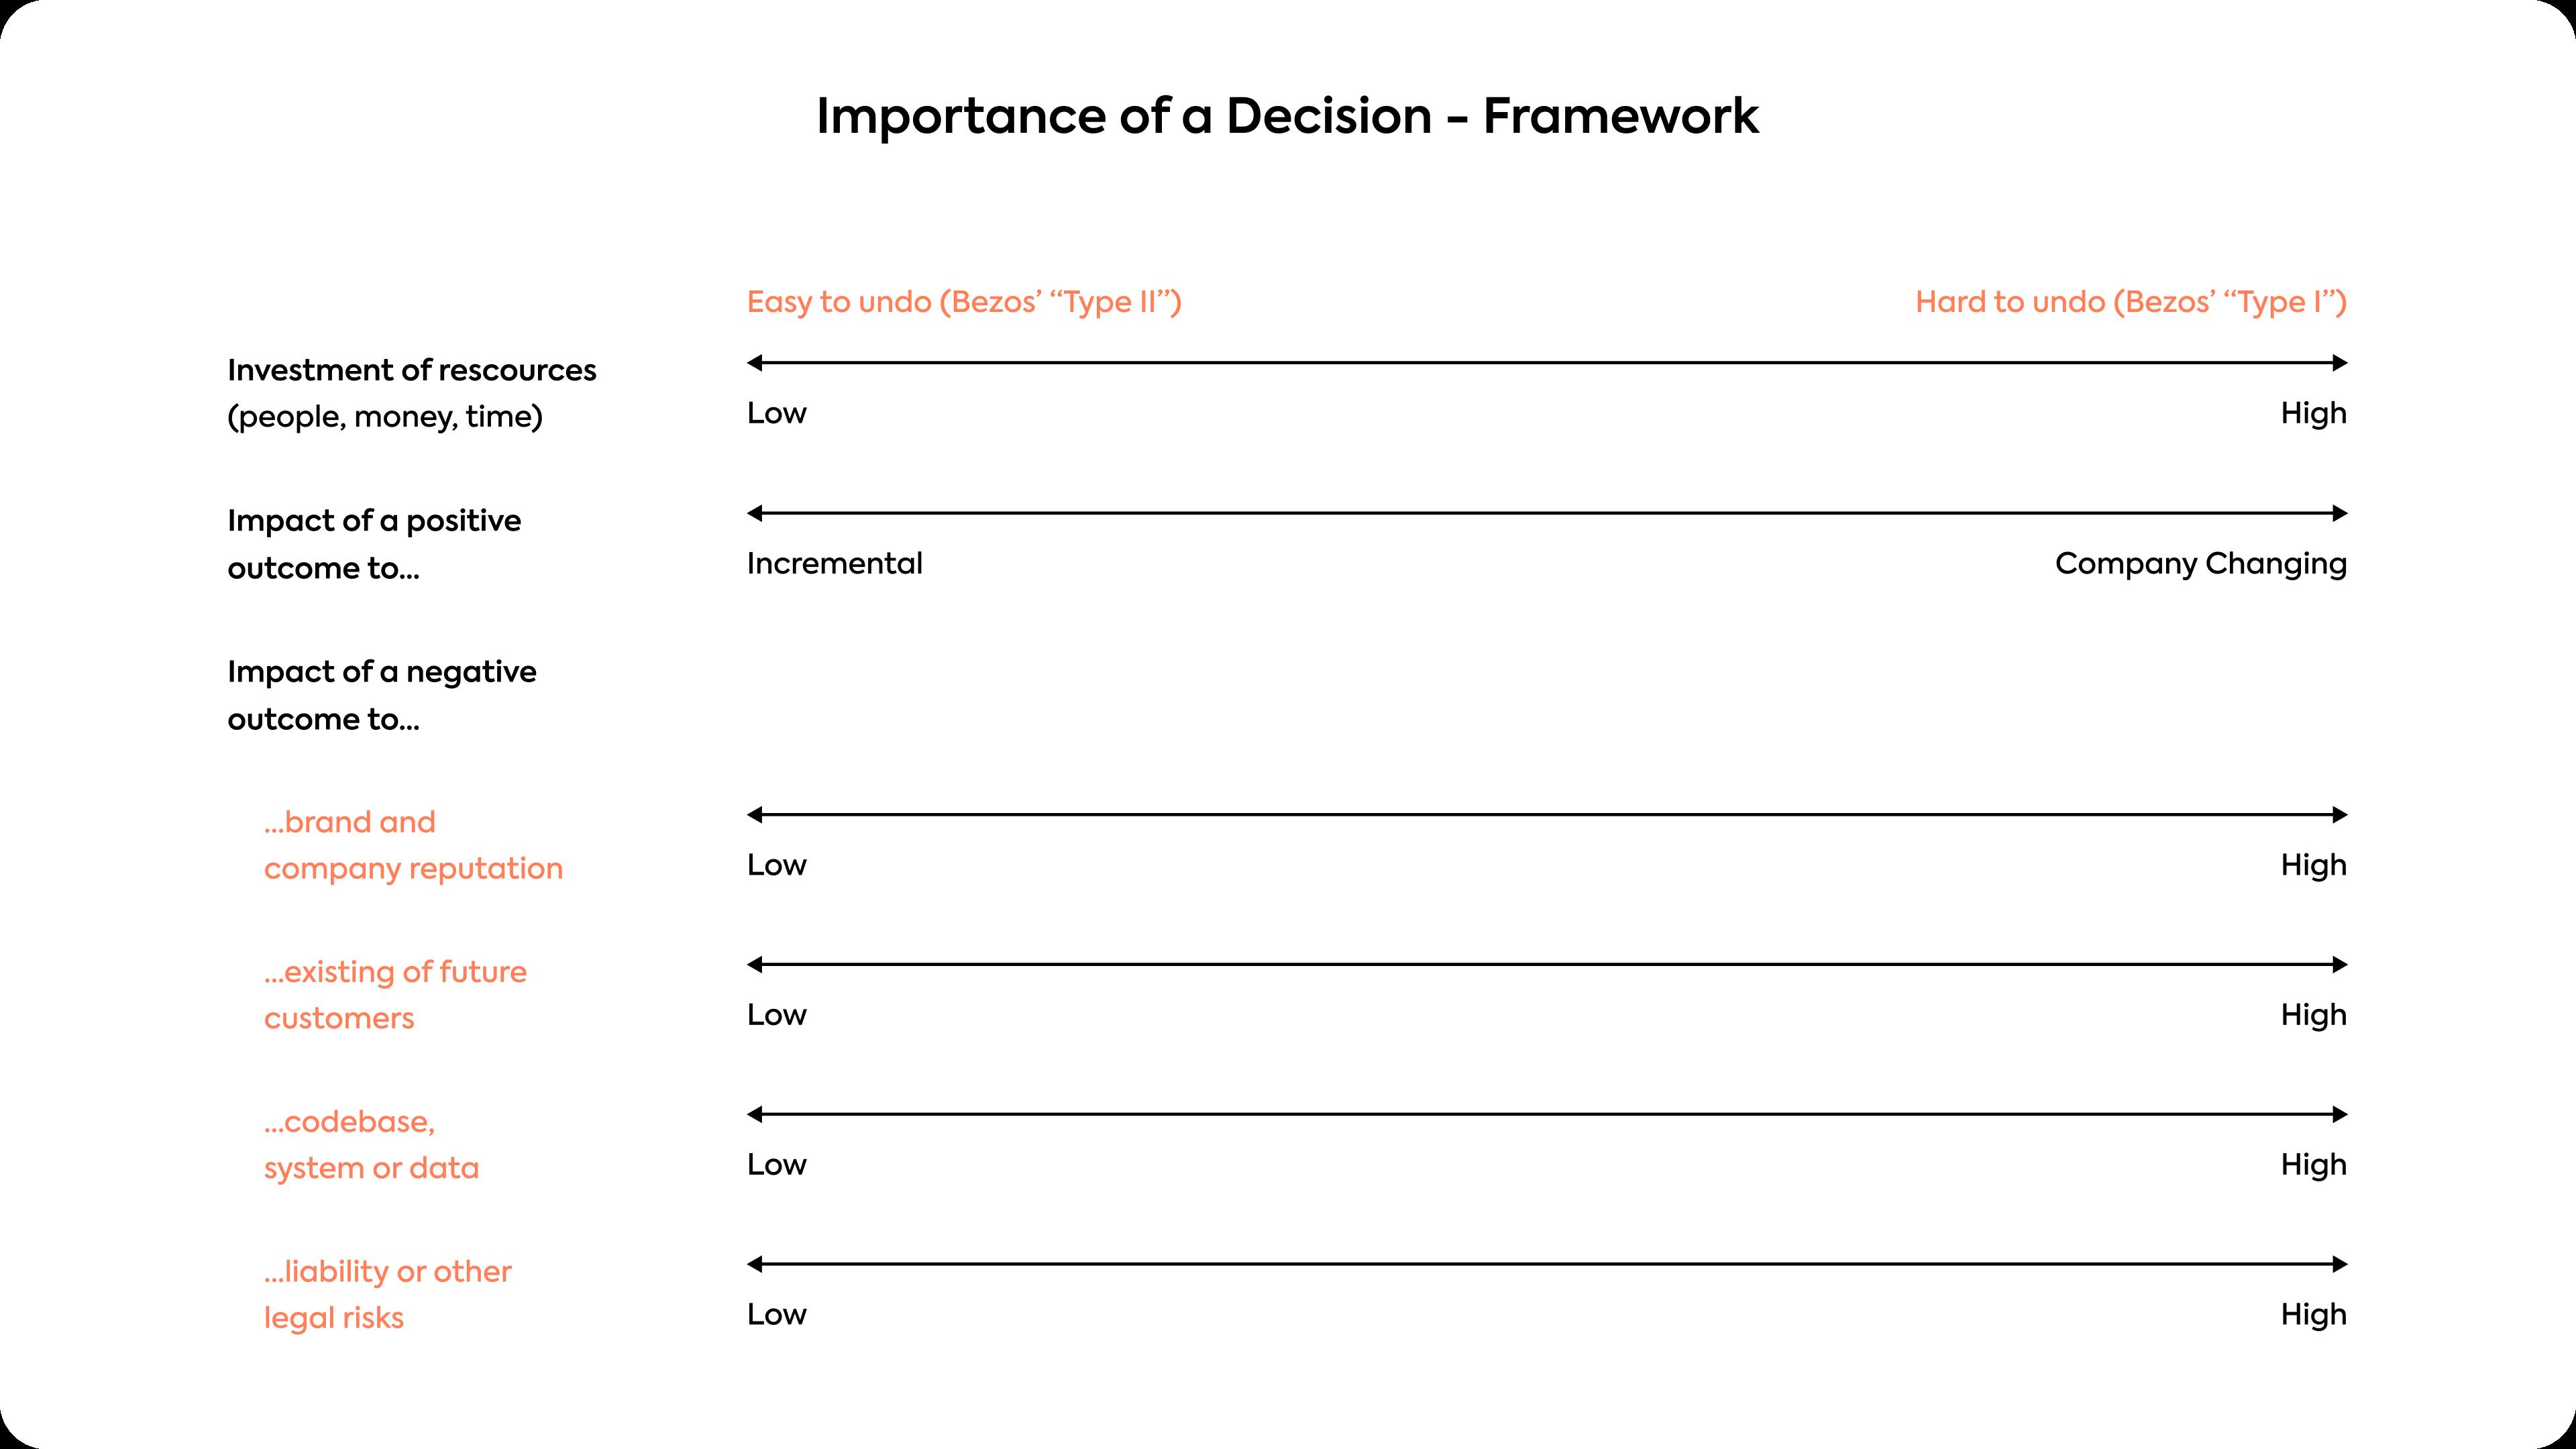 Importance of a decision - framework